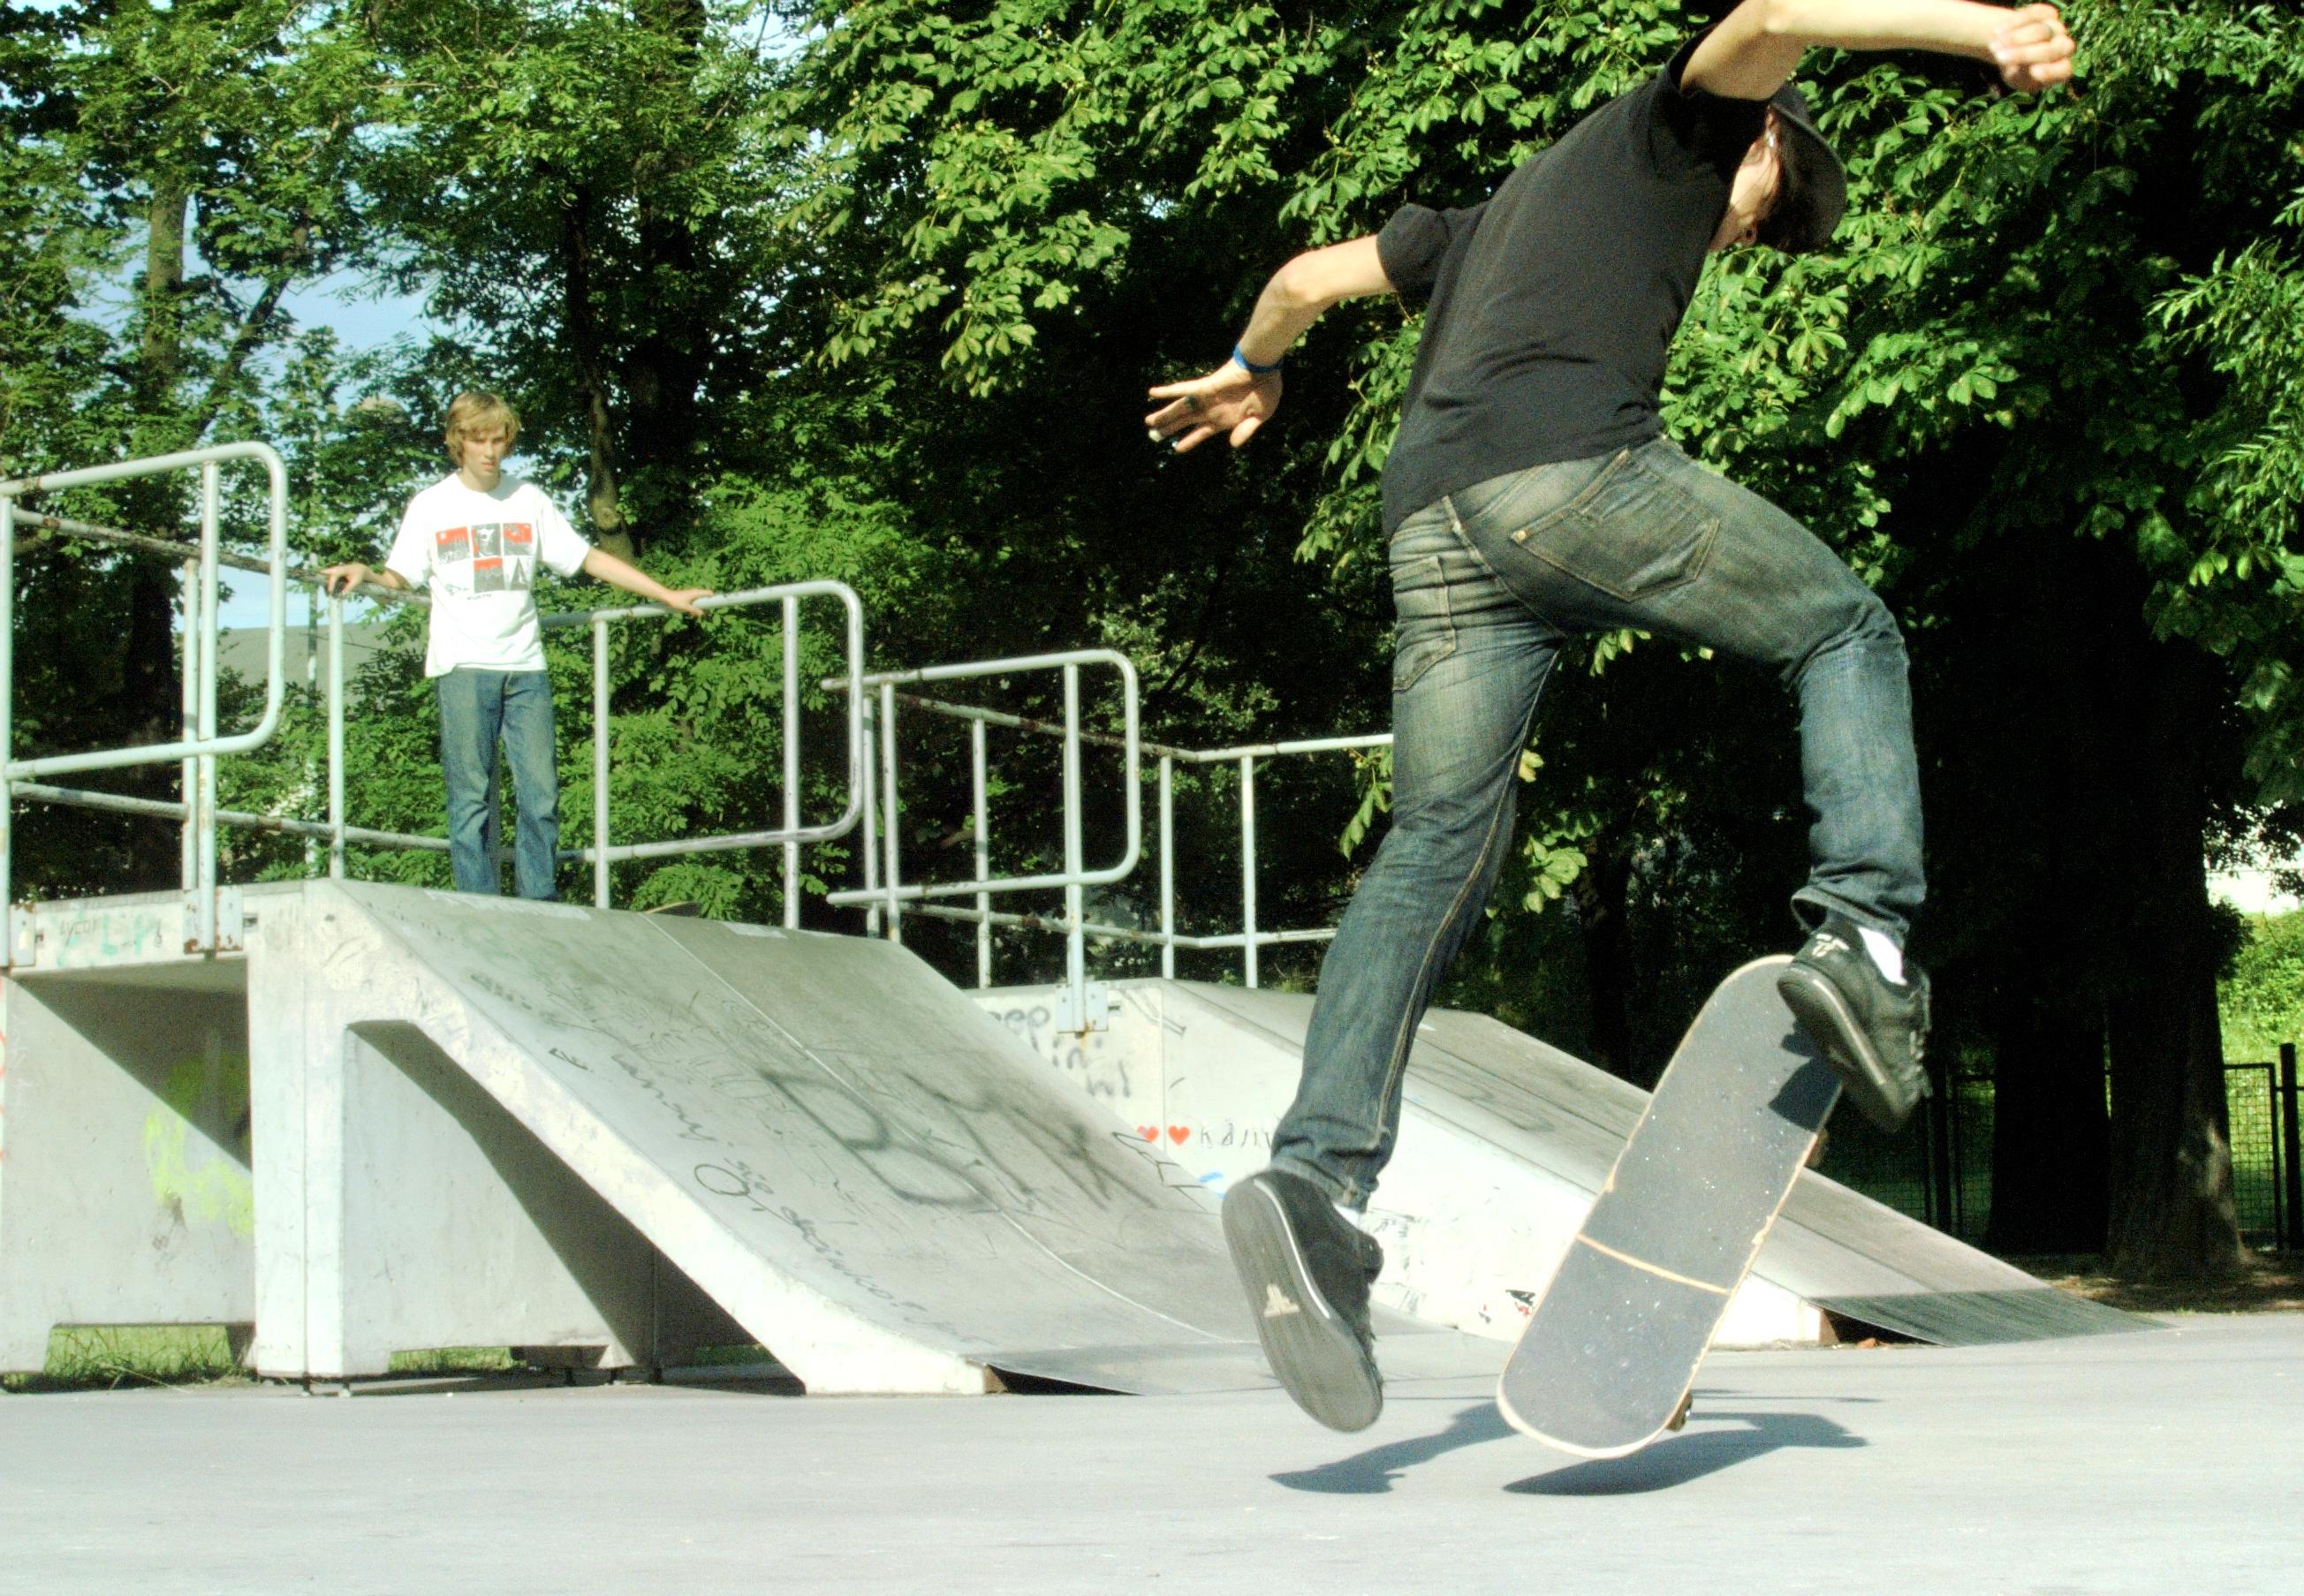 Skatepark Dagger, Santa Teresita.